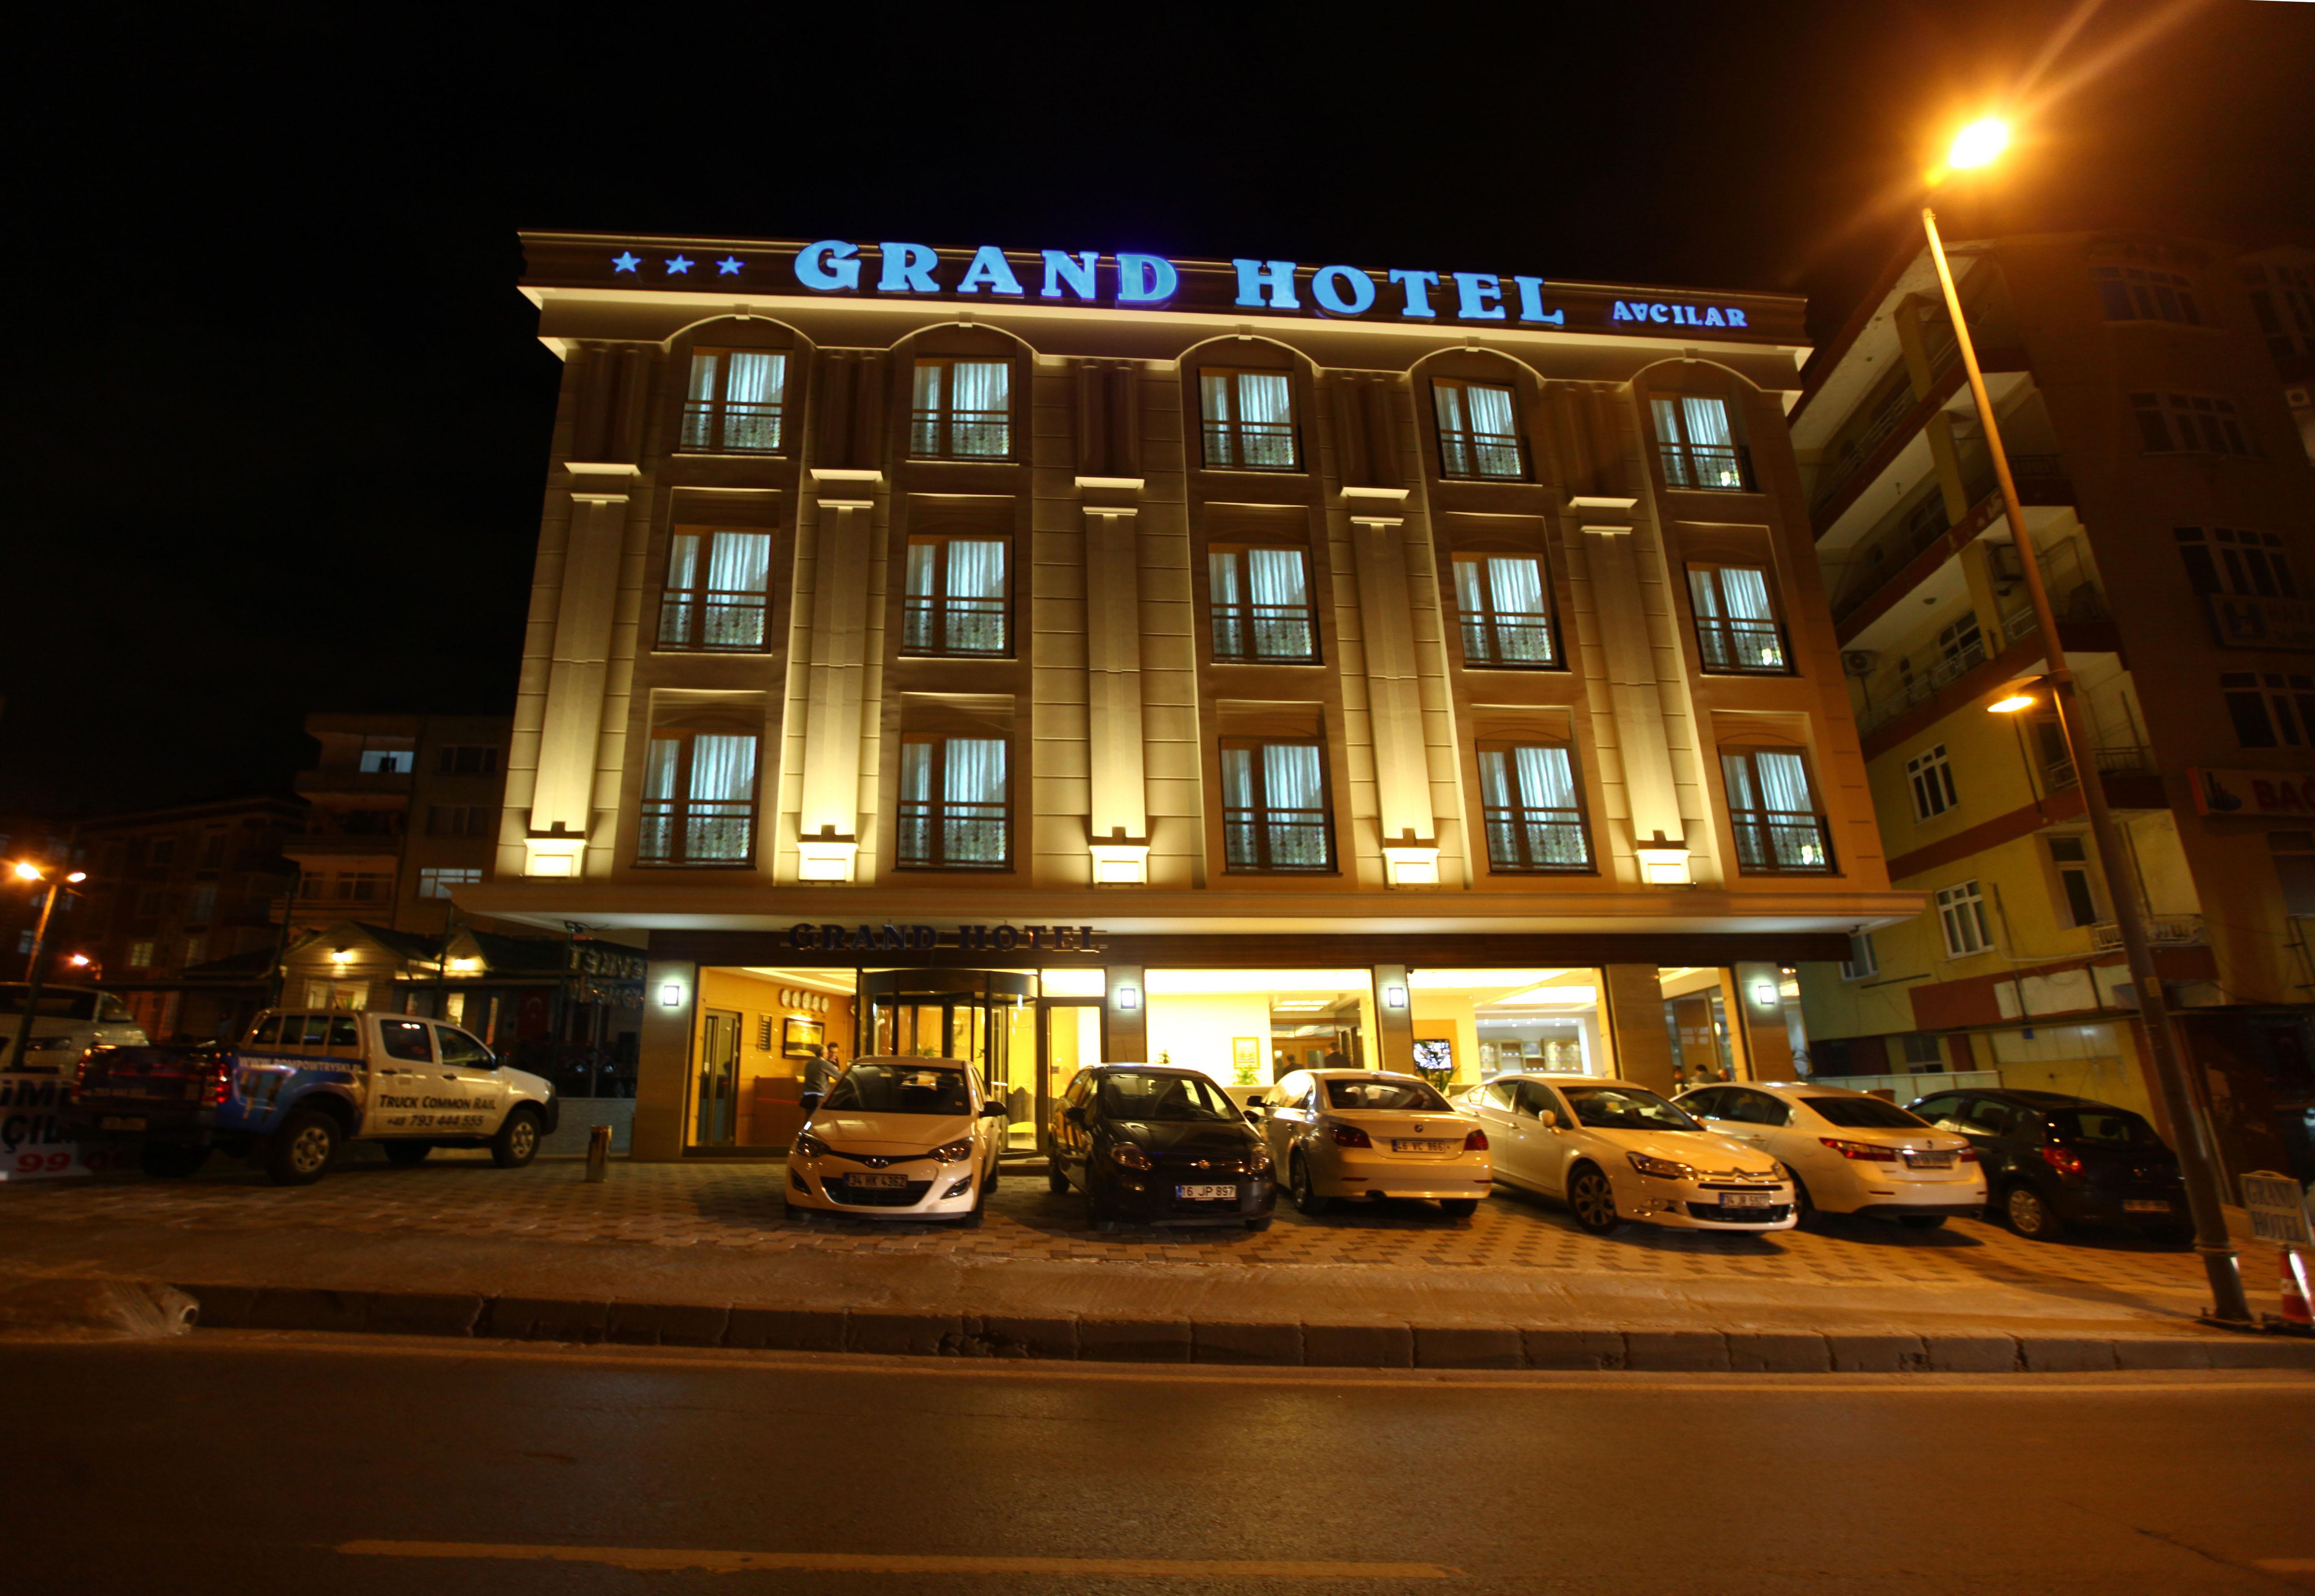 GRAND HOTEL AVCILAR8104